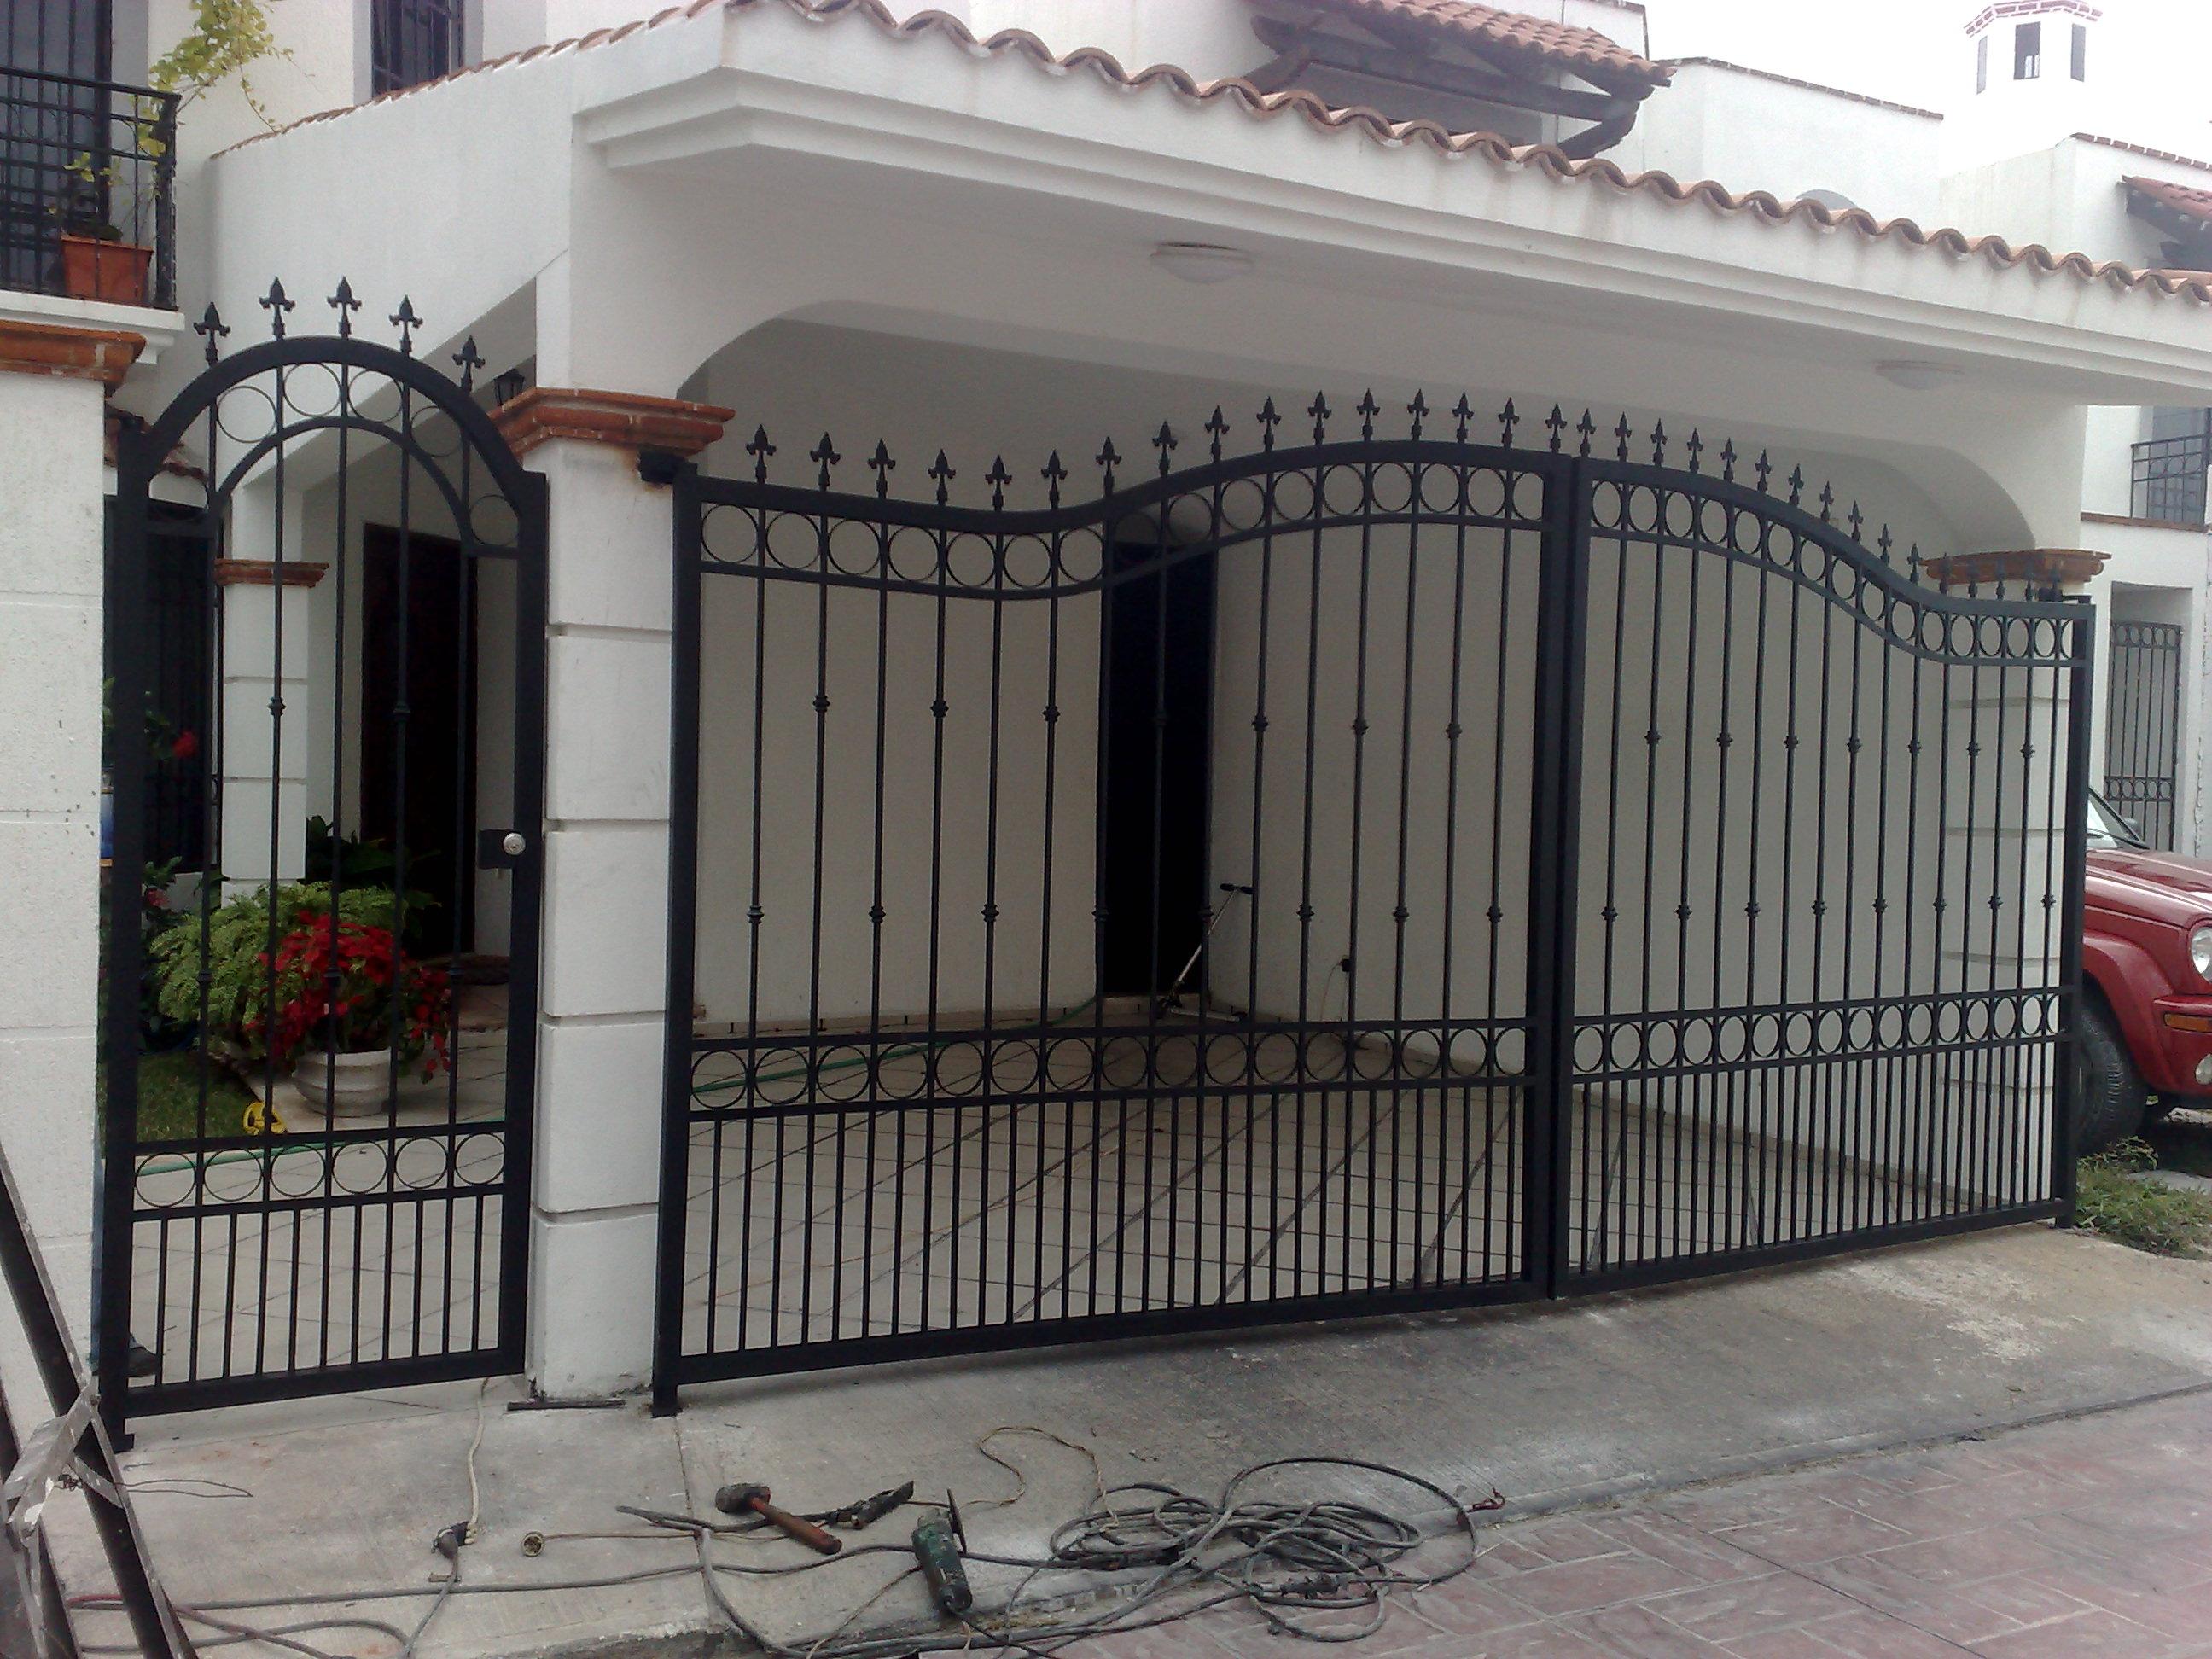 Puertas puertas de herreria puertas ventanas catalogo for Puertas de herreria forjada